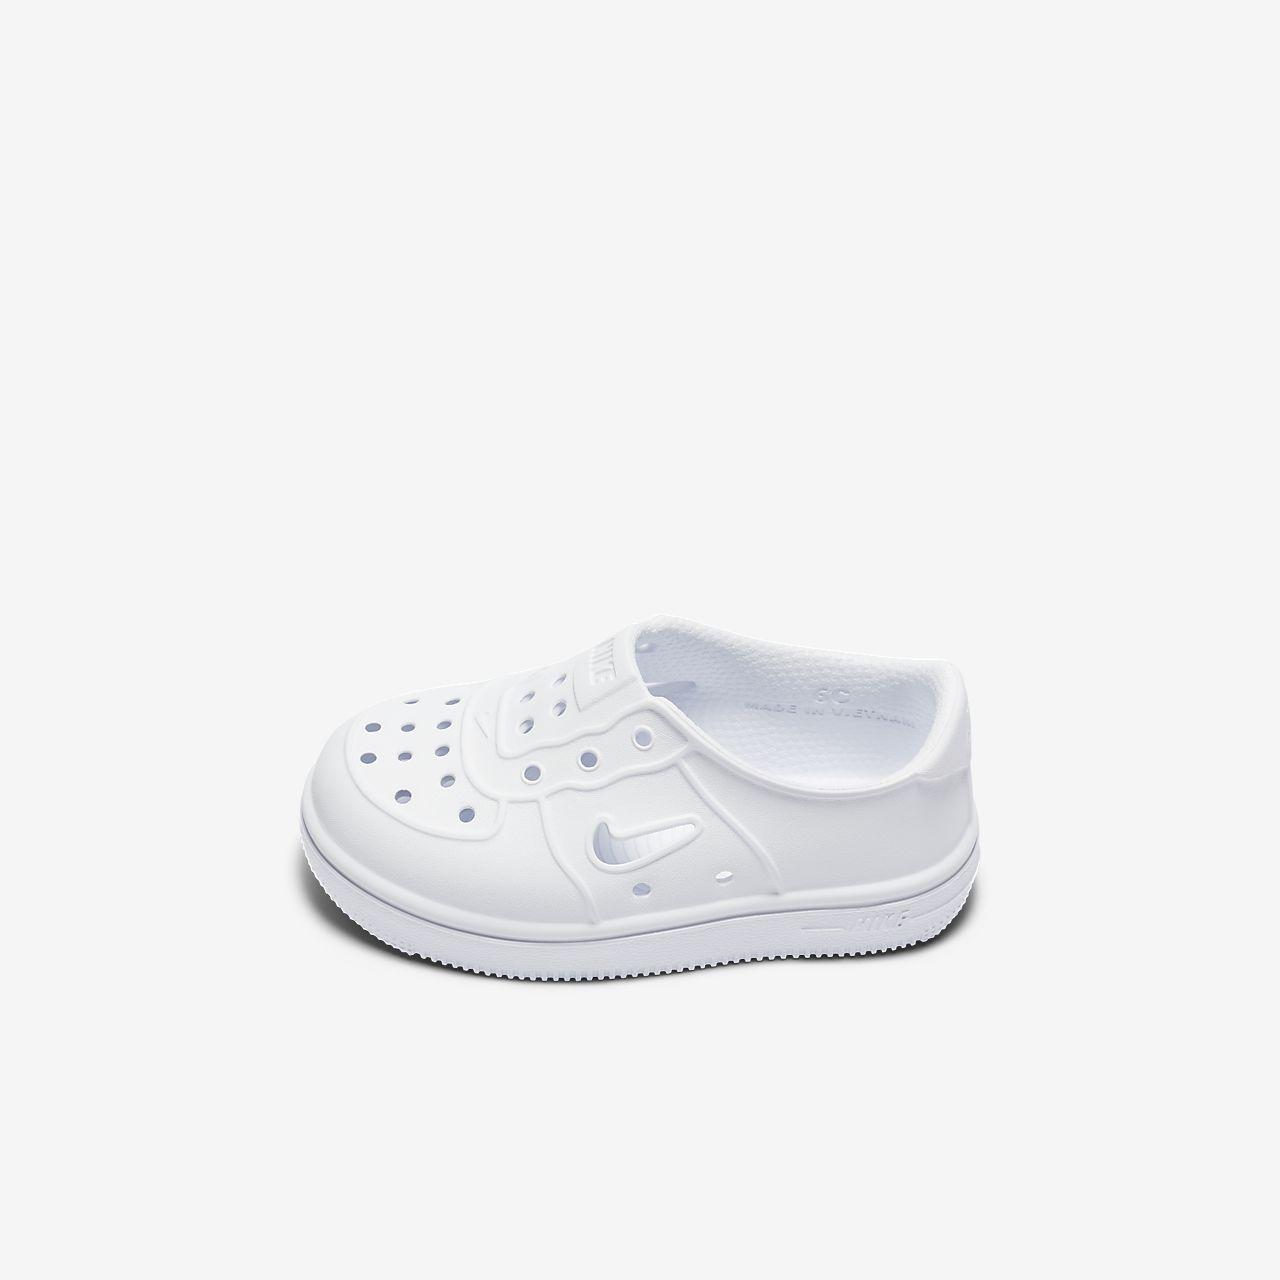 0d697dce Кроссовки для малышей Nike Foam Force 1. Nike.com RU